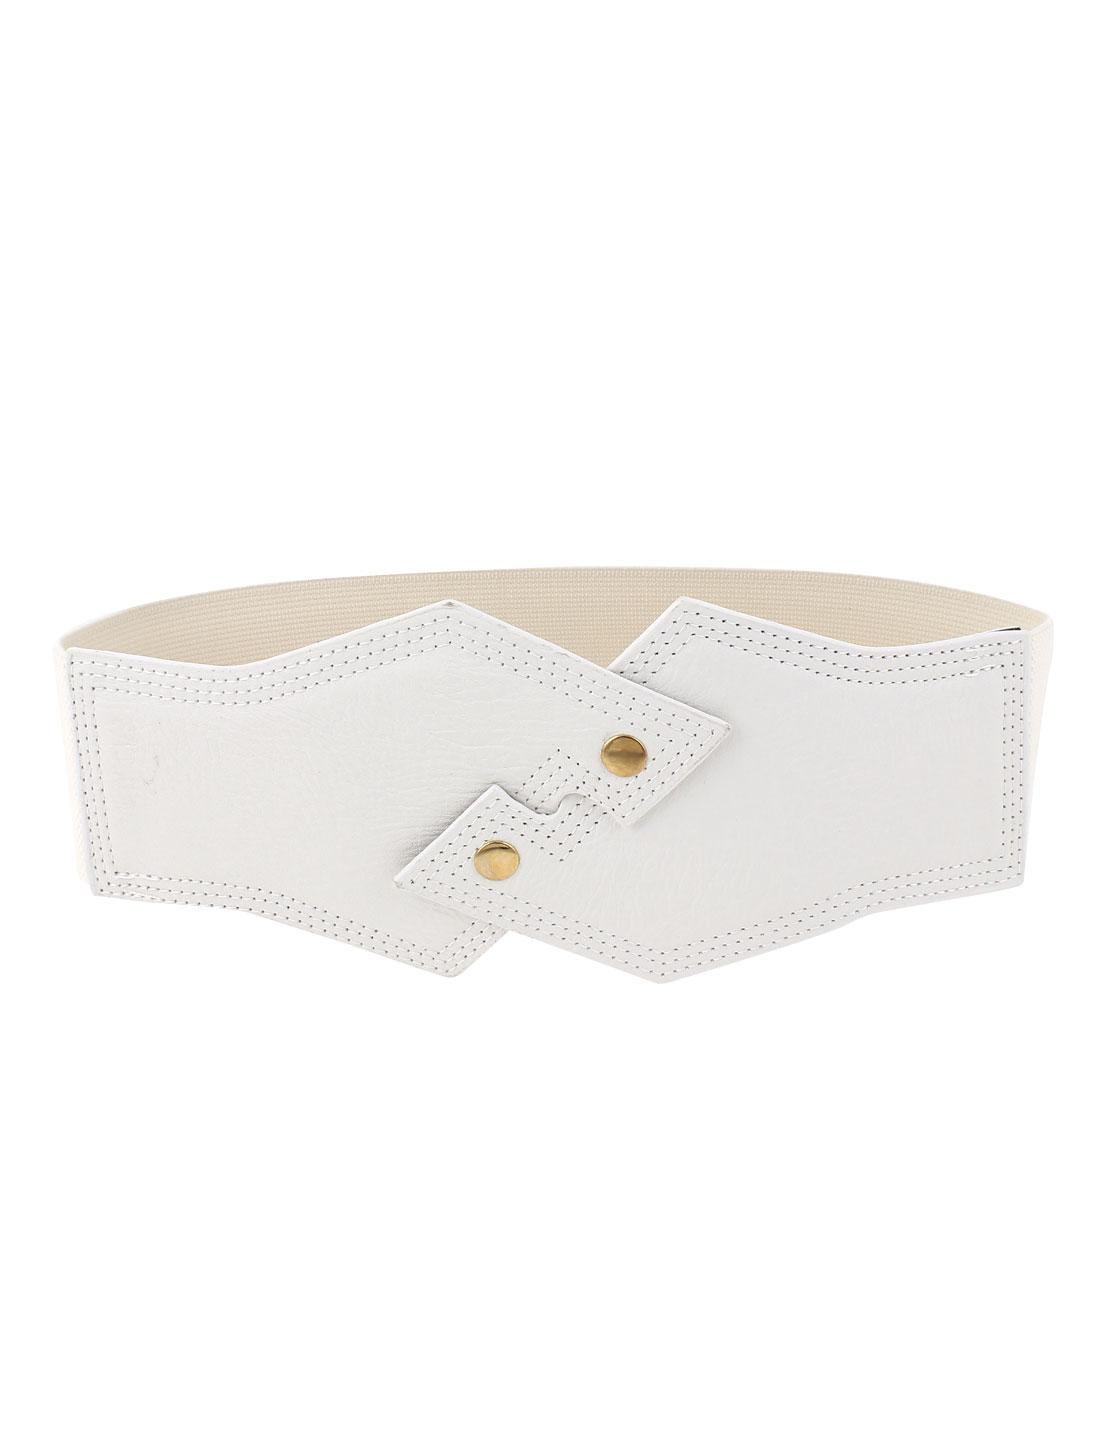 Lady Faux Leather Interlock Buckle Elastic Waist Belt Waistband White